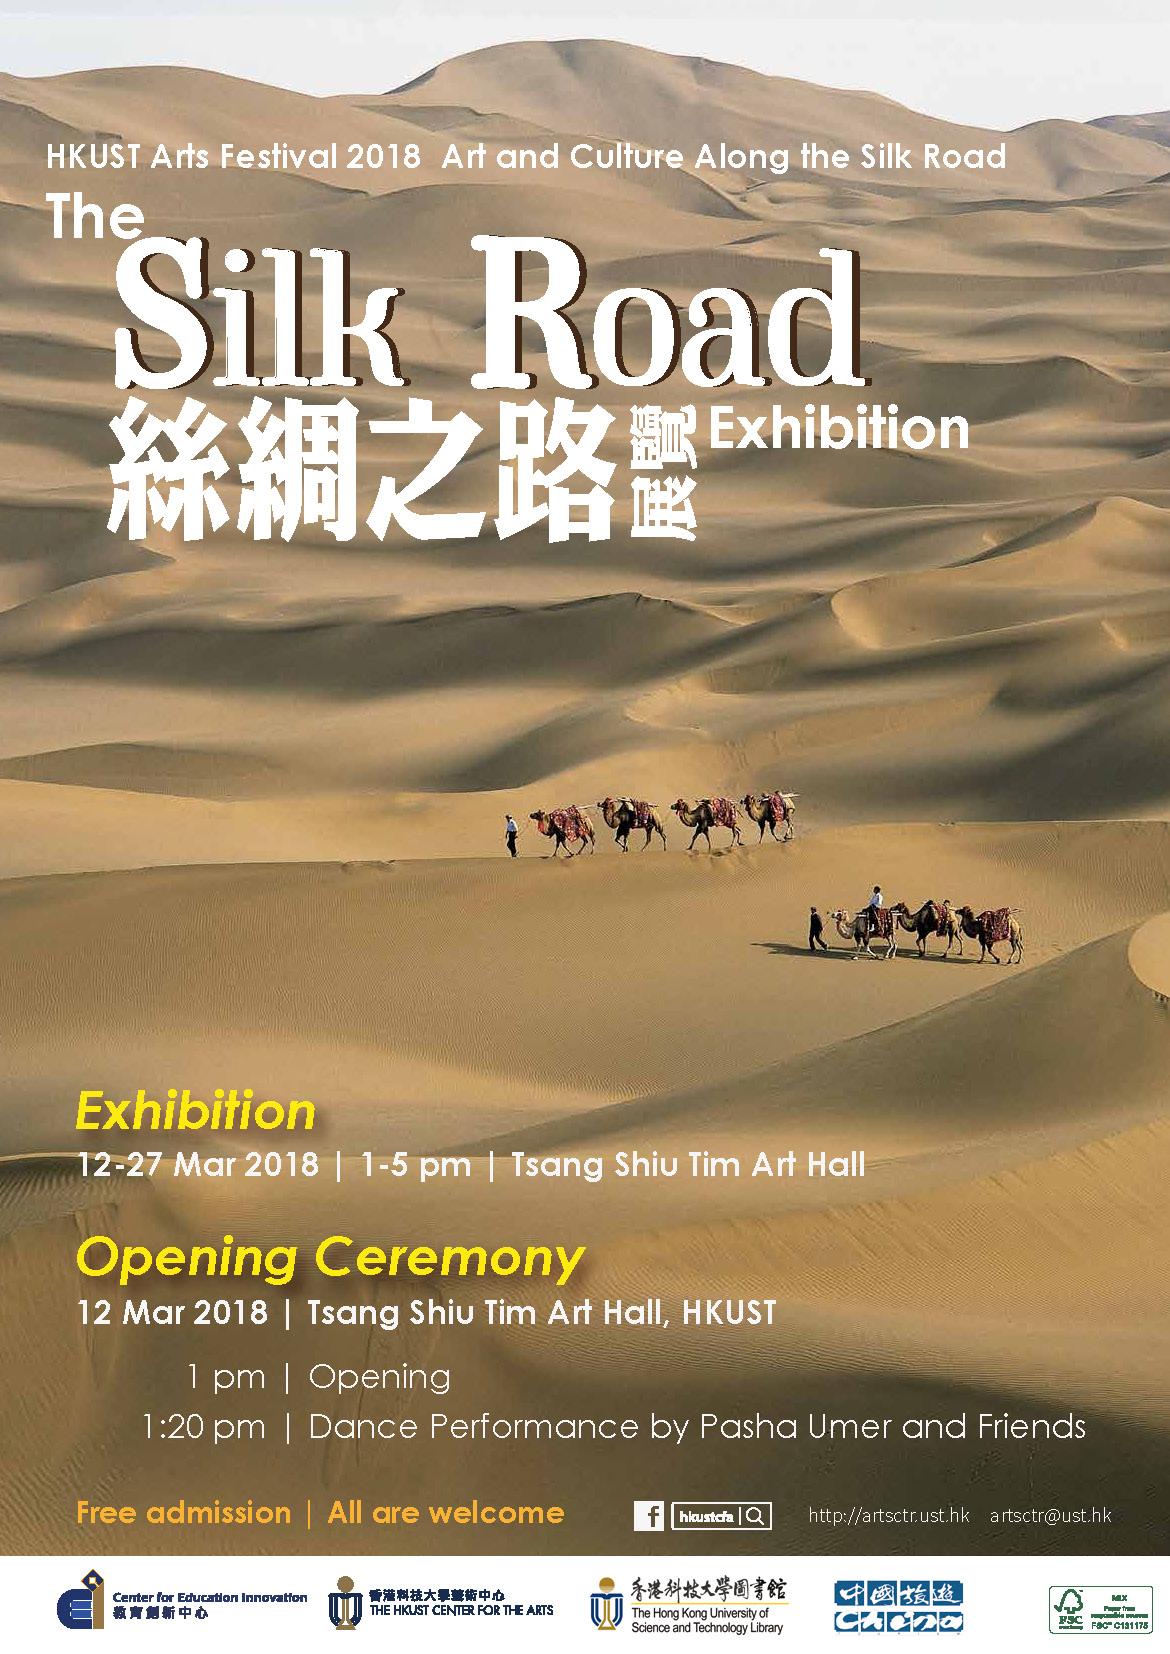 The Silk Road Exhibition 絲綢之路展覽  Mar 12-27, 2018